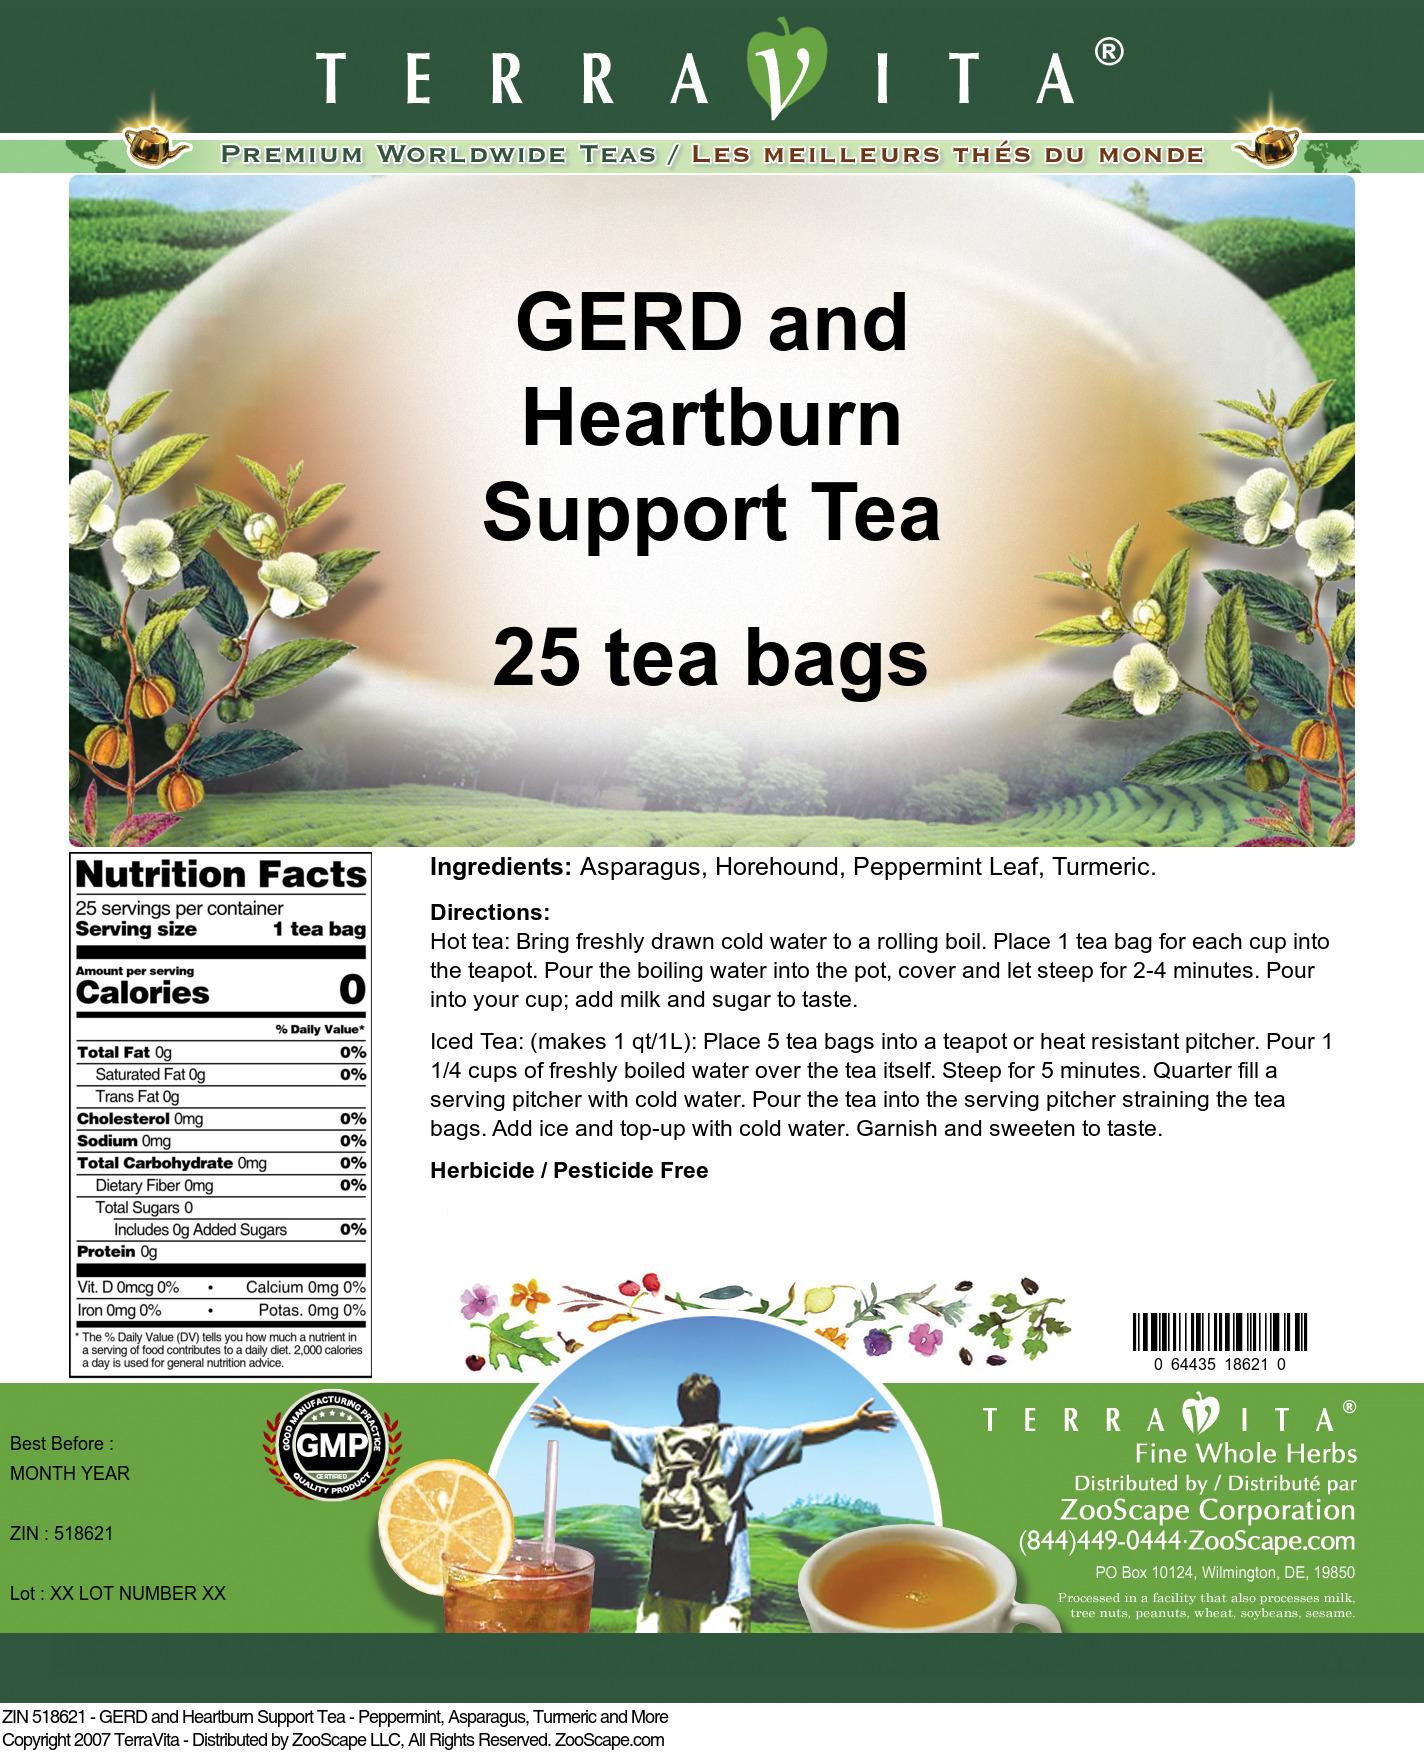 GERD and Heartburn Support Tea - Peppermint, Asparagus, Turmeric and More